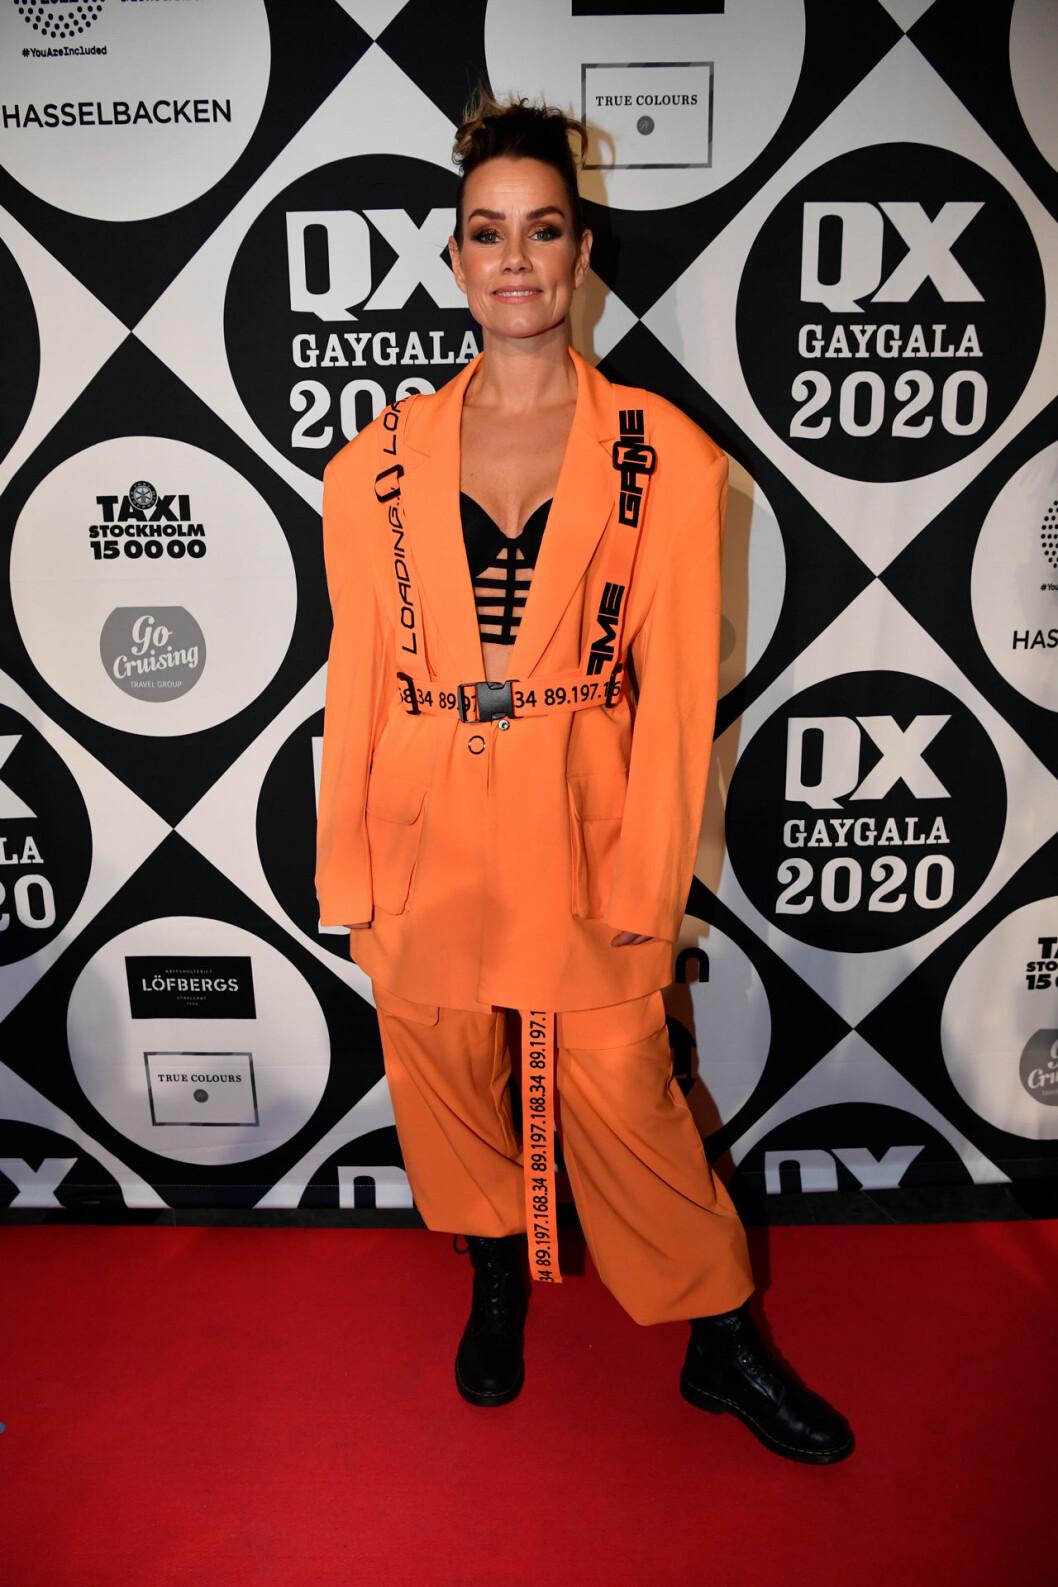 Linda Bengtzing på röda mattan på QX-galan 2020